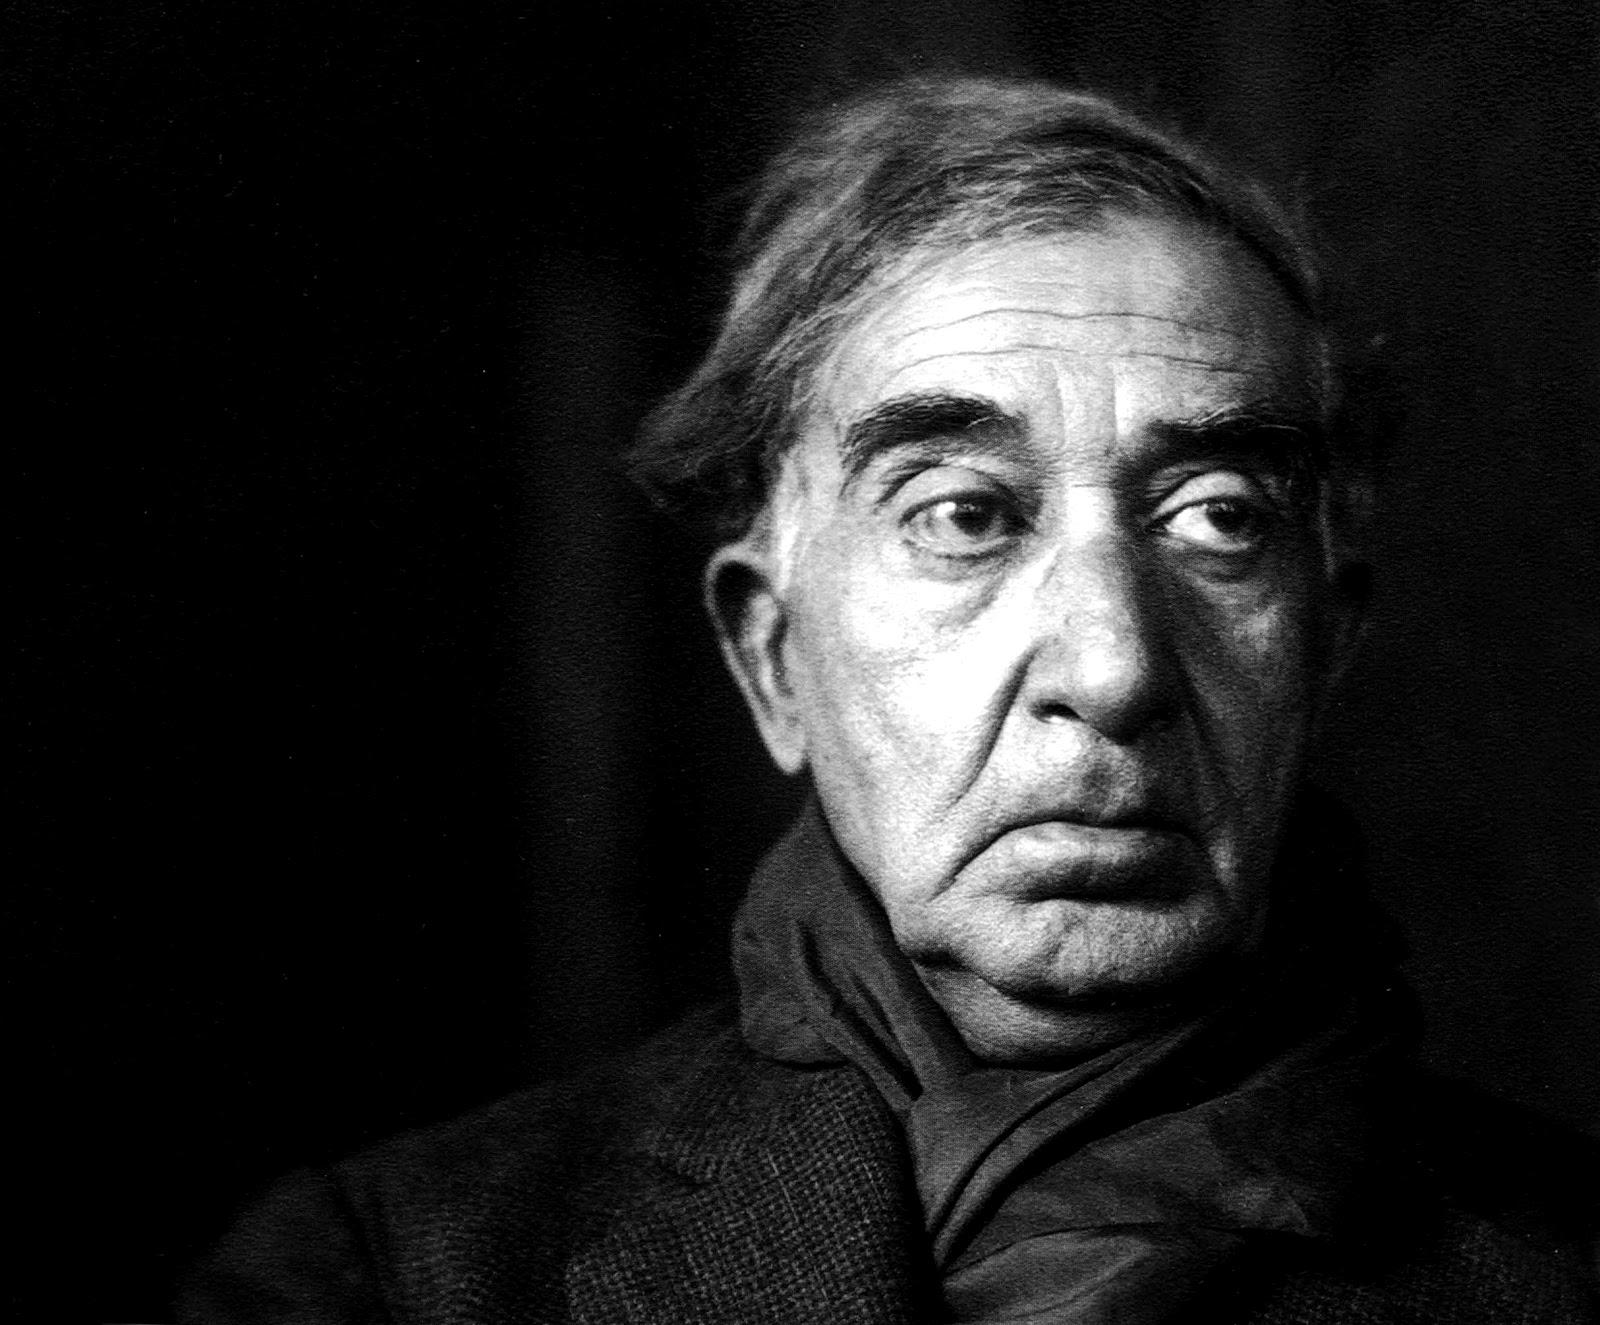 Konstantinos Kavafis